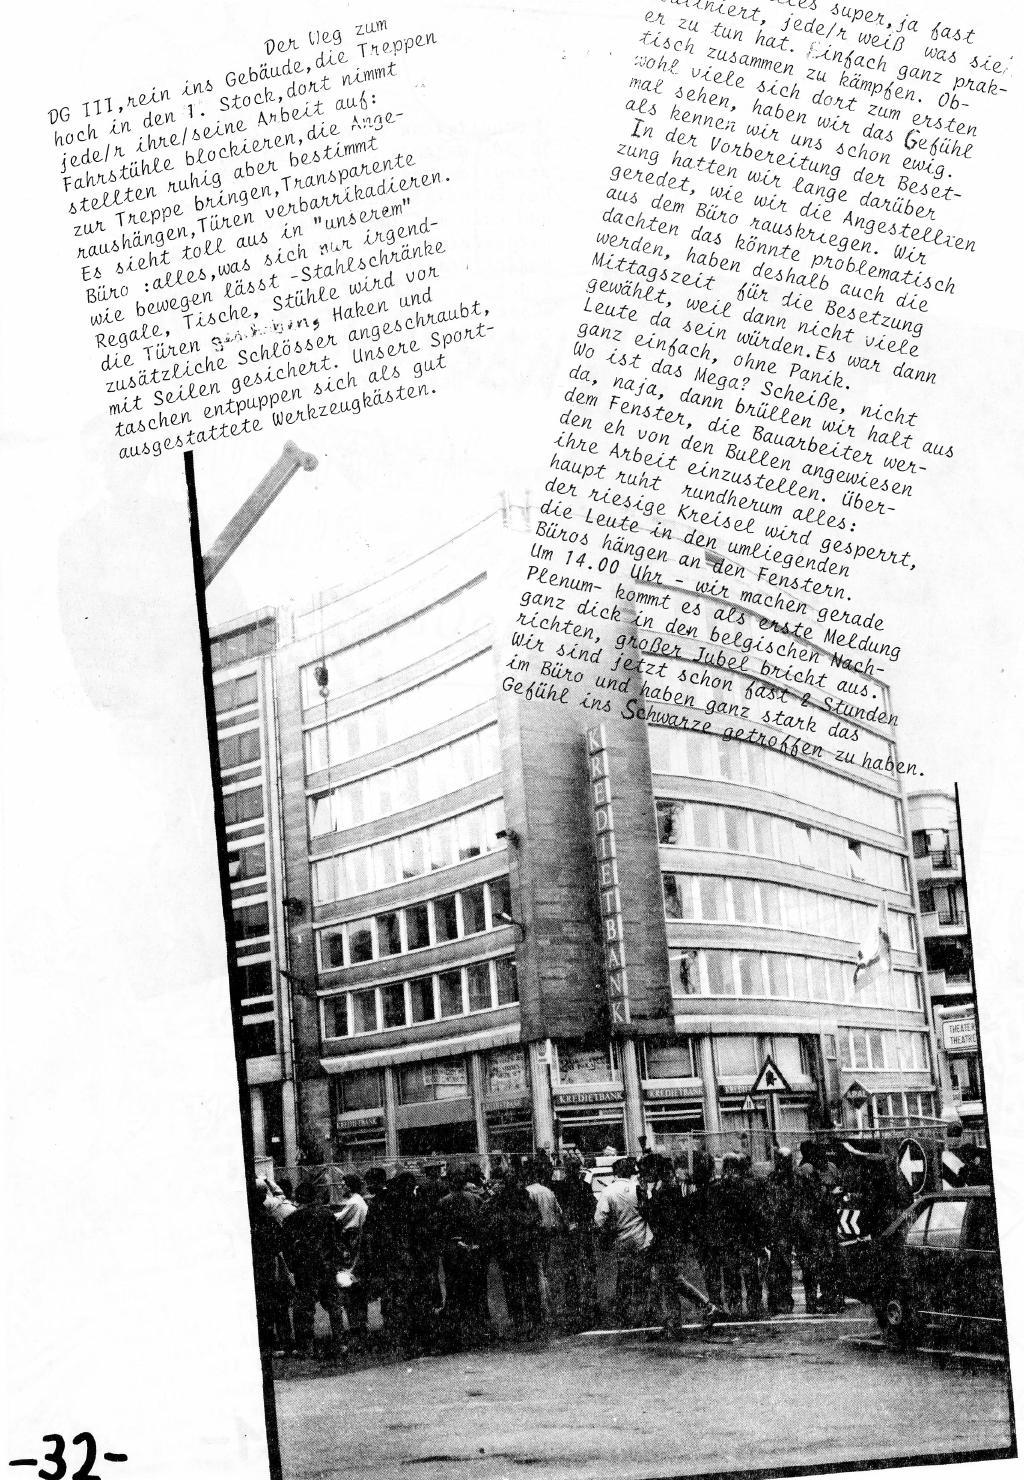 Belgien_Doku_Besetzung_EG_Kommission_1989_034